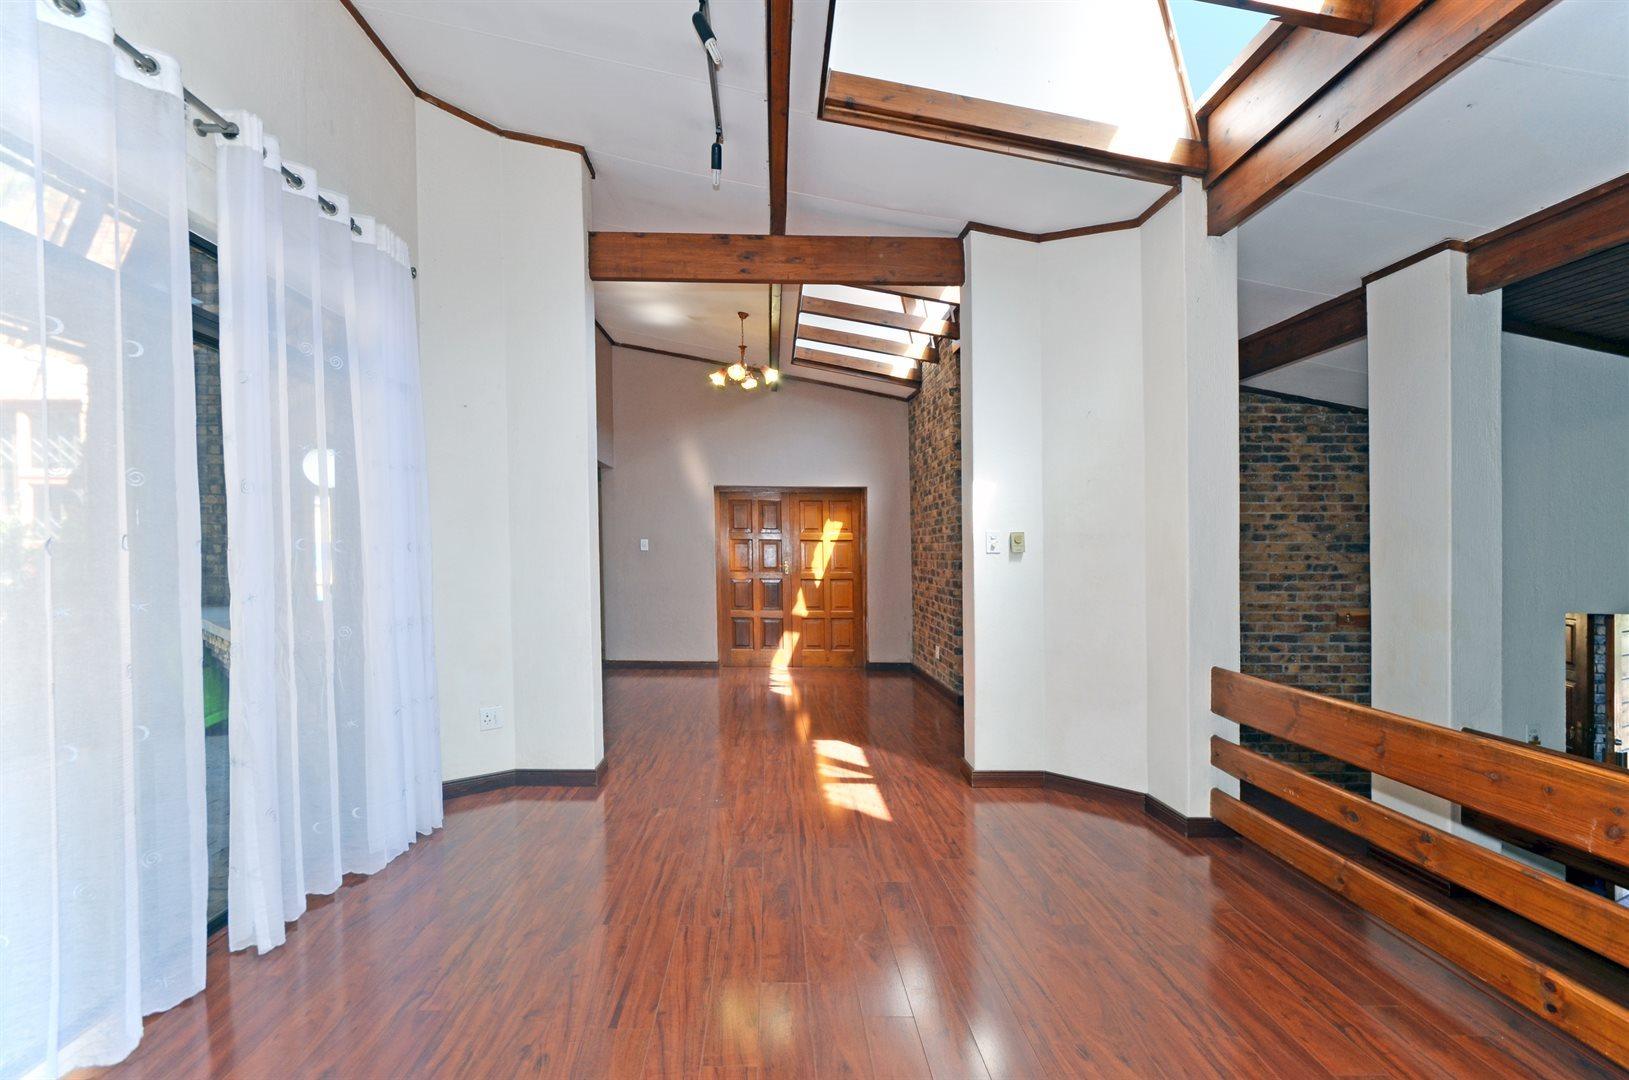 Johannesburg, Lyndhurst Property  | Houses For Sale Lyndhurst, Lyndhurst, House 3 bedrooms property for sale Price:1,950,000